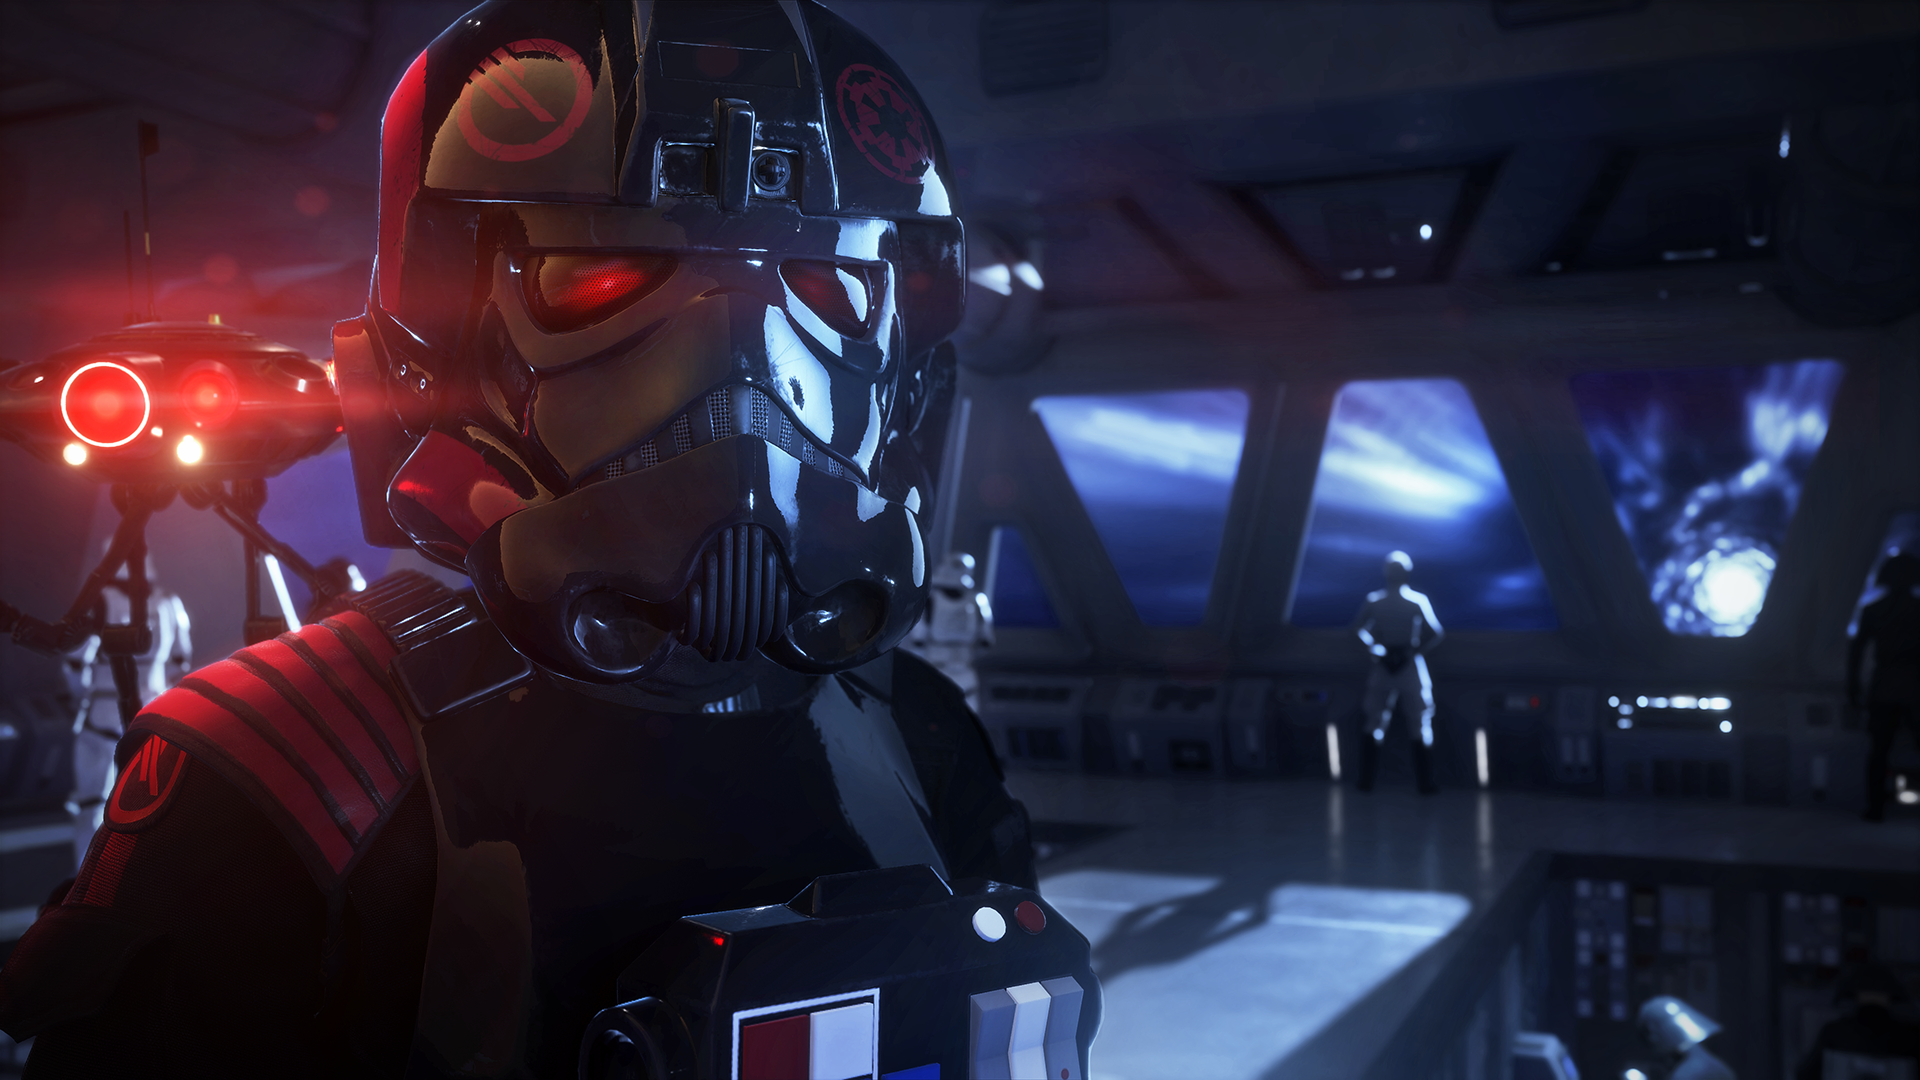 Han Solo Season Coming To Star Wars Battlefront Ii Star Wars Battlefront Battlefront Star Wars